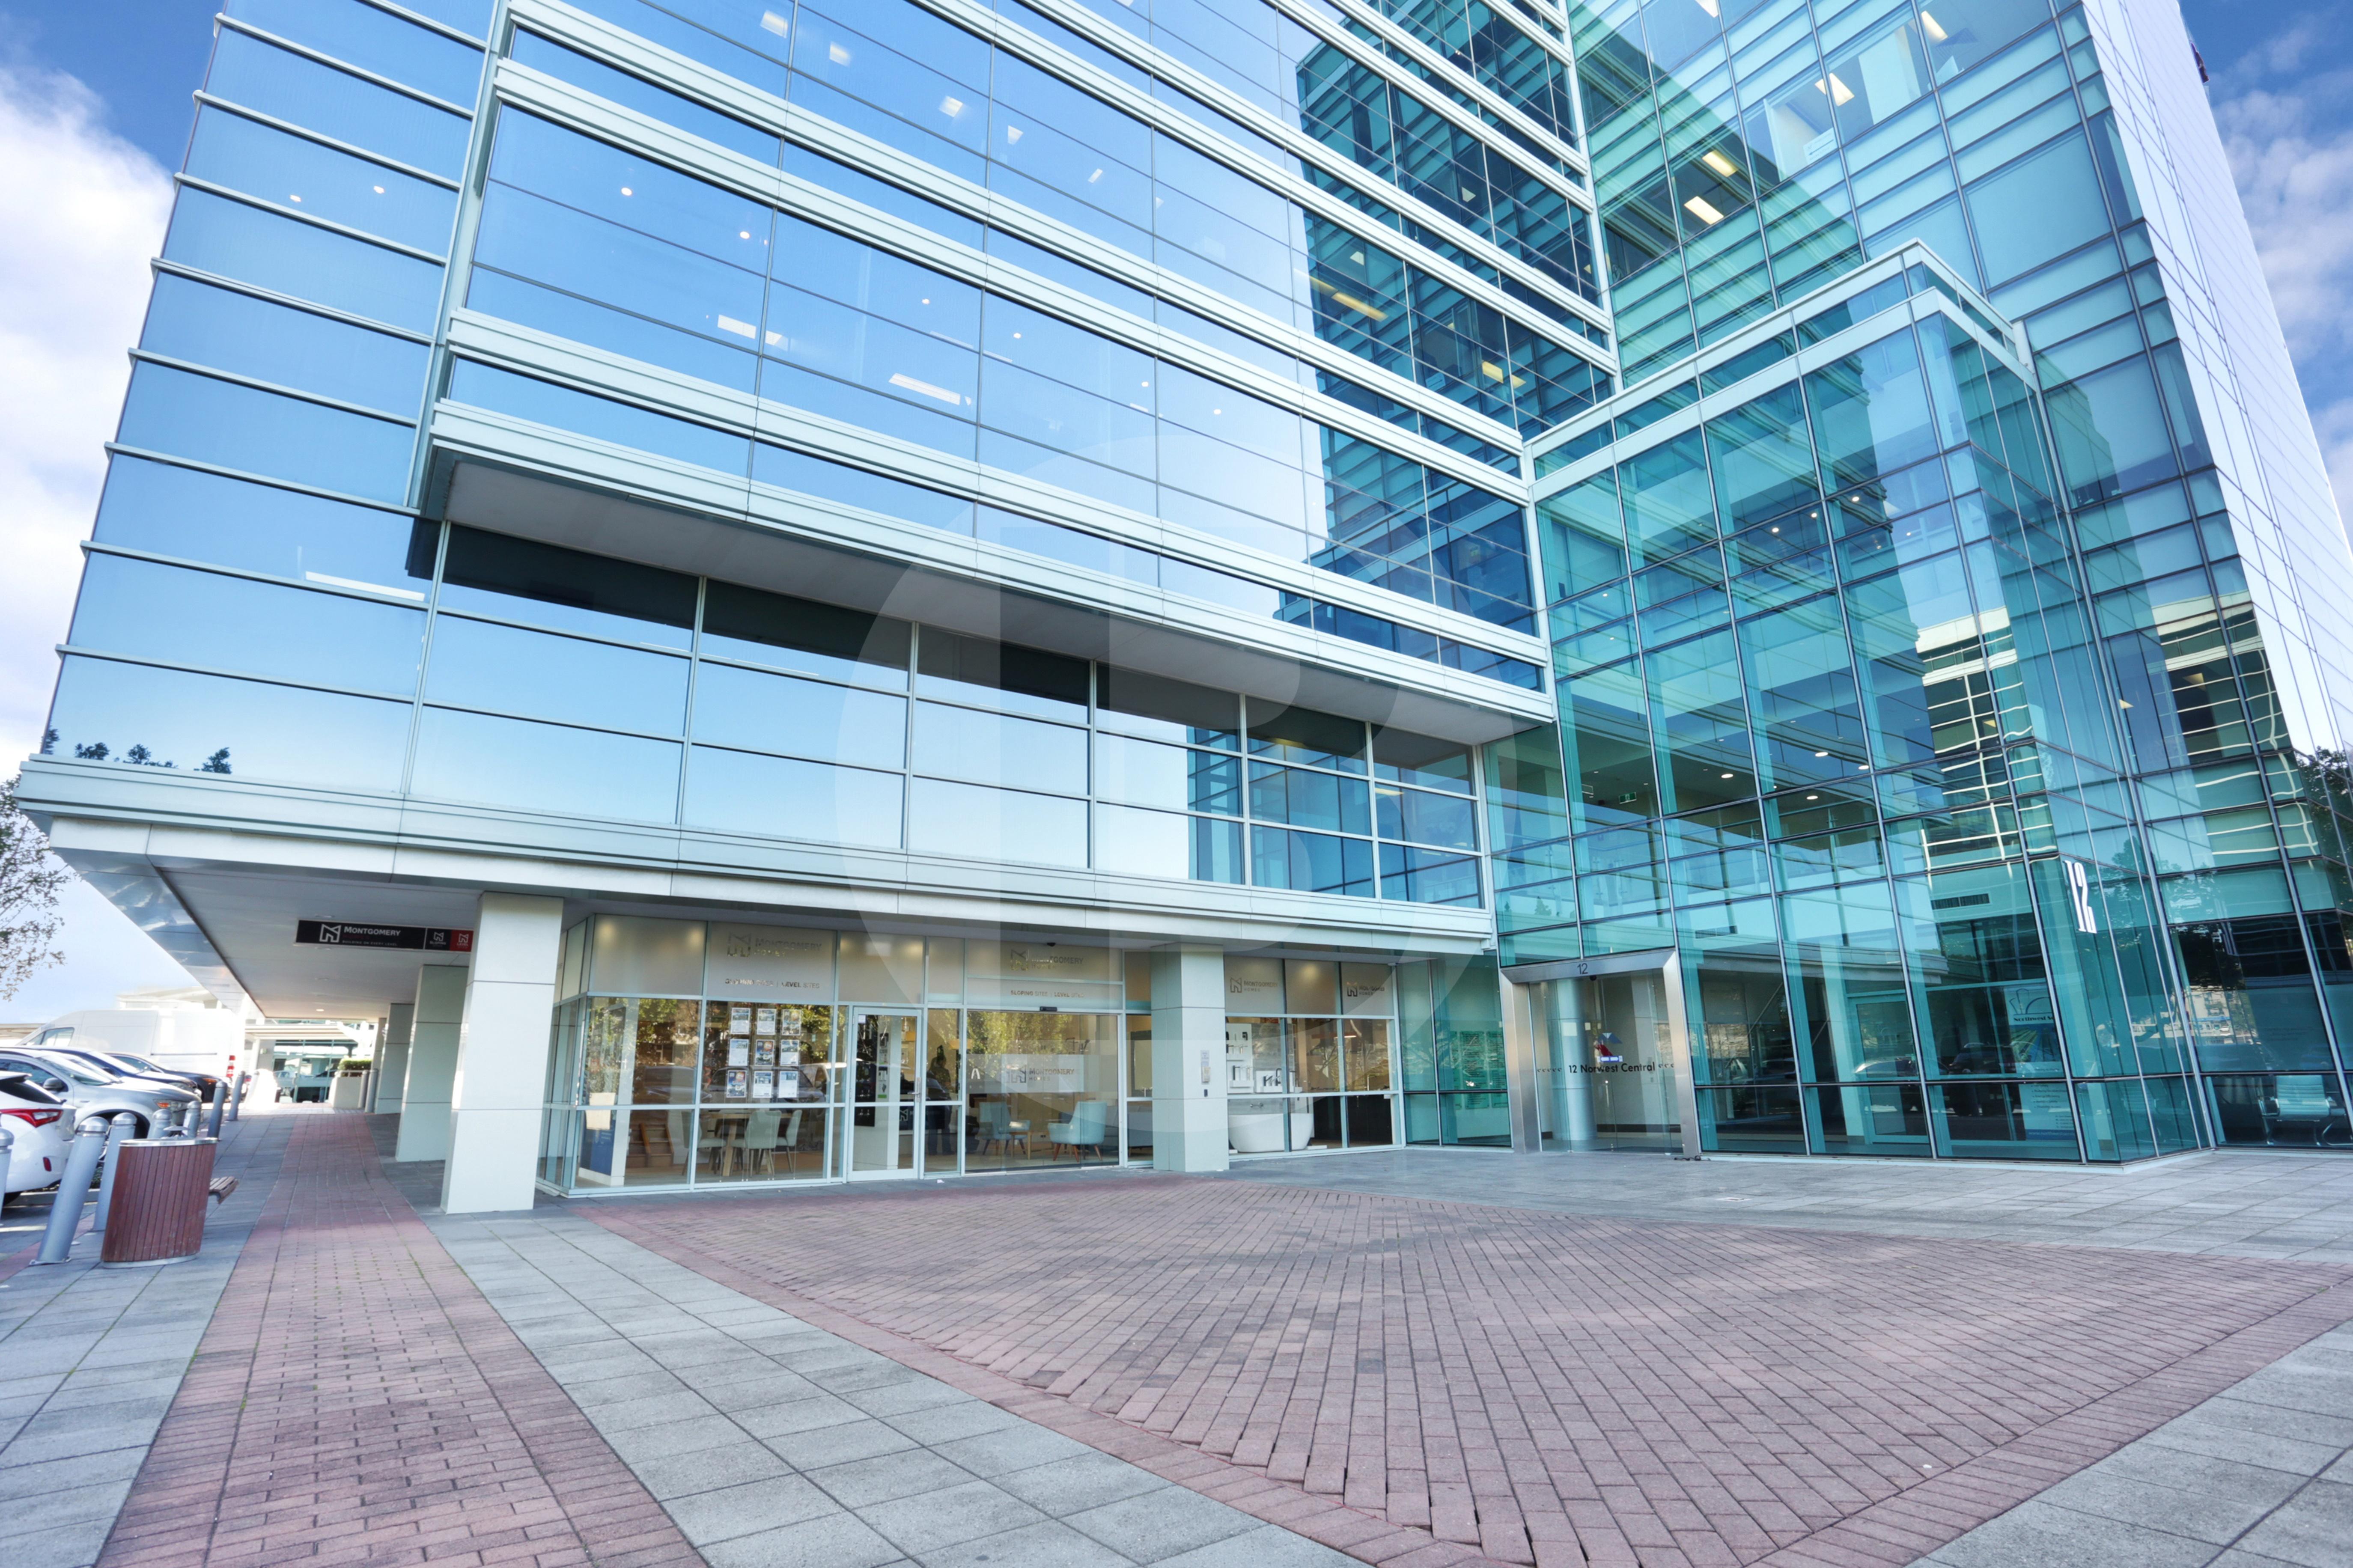 COMMERCIAL OFFICE, SHOWROOM, RETAIL | BAULKHAM HILLS